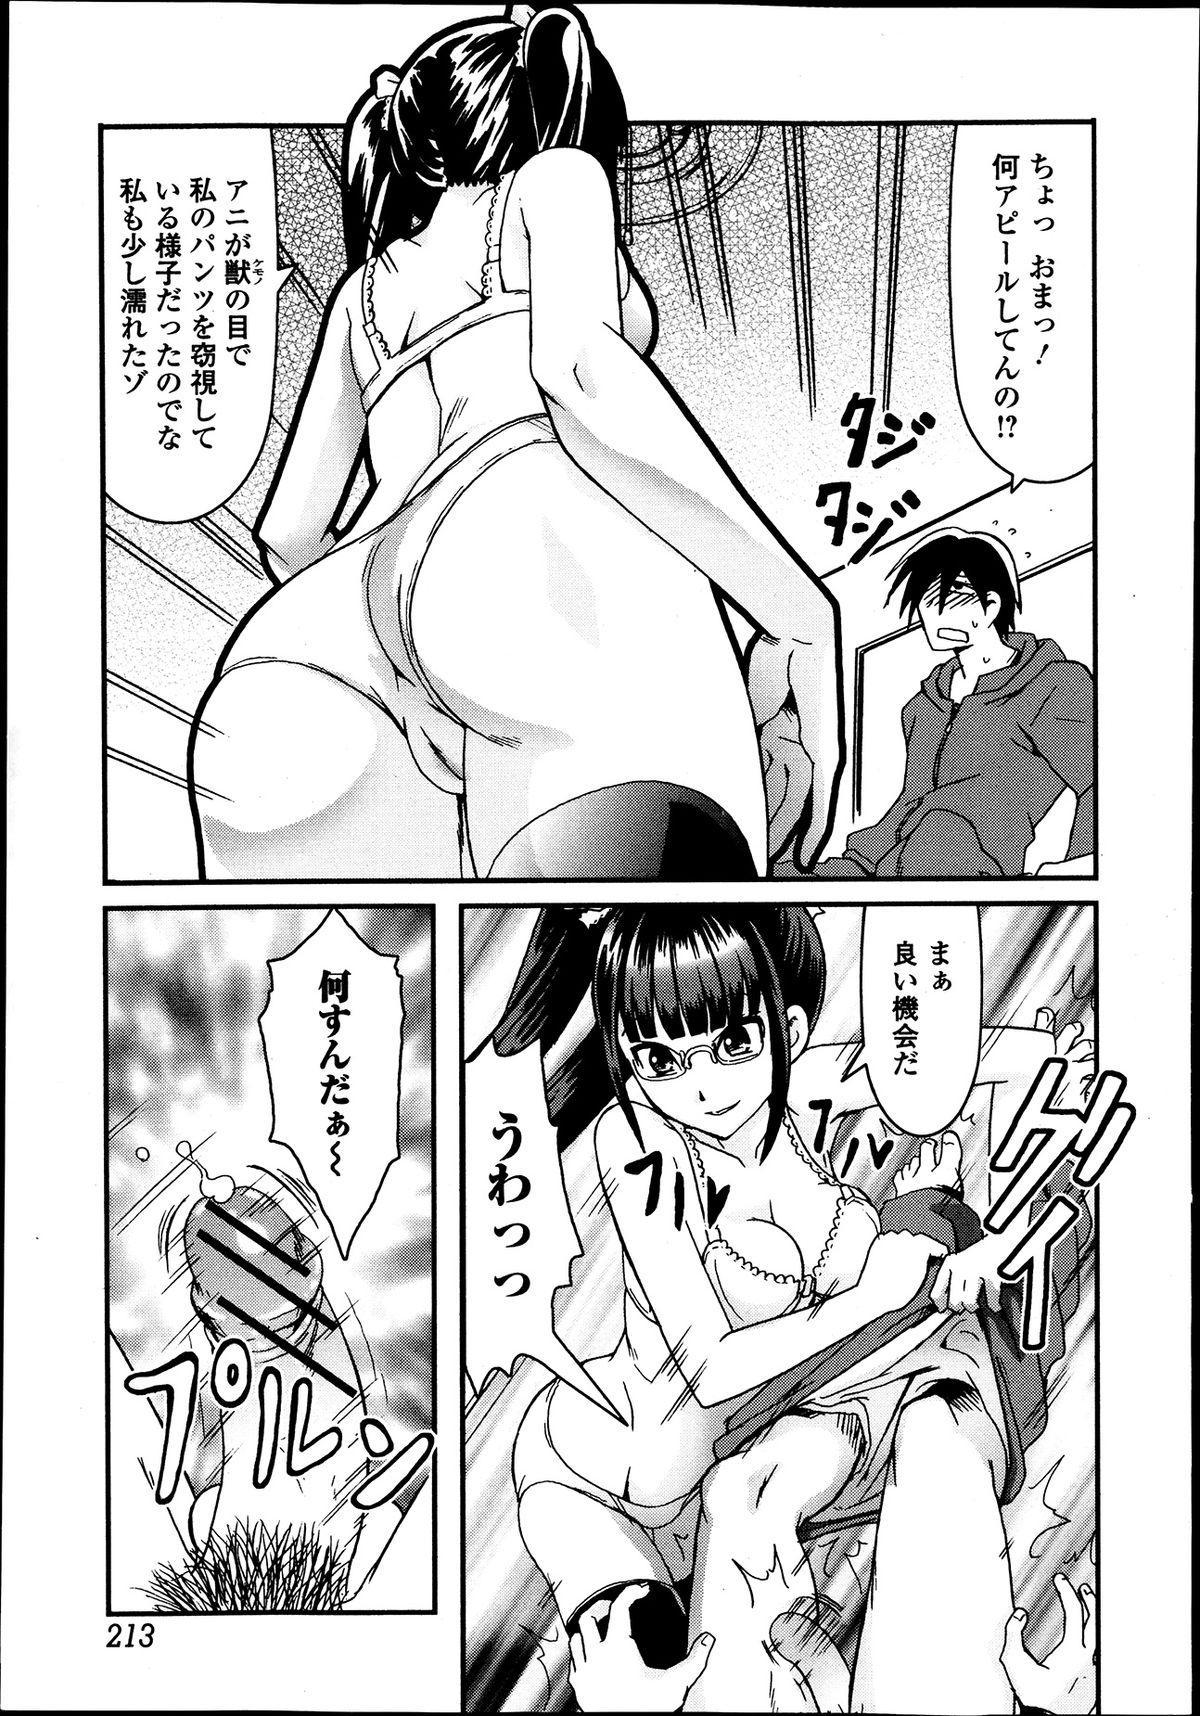 Bishoujo Kakumei KIWAME Road Vol.9 212